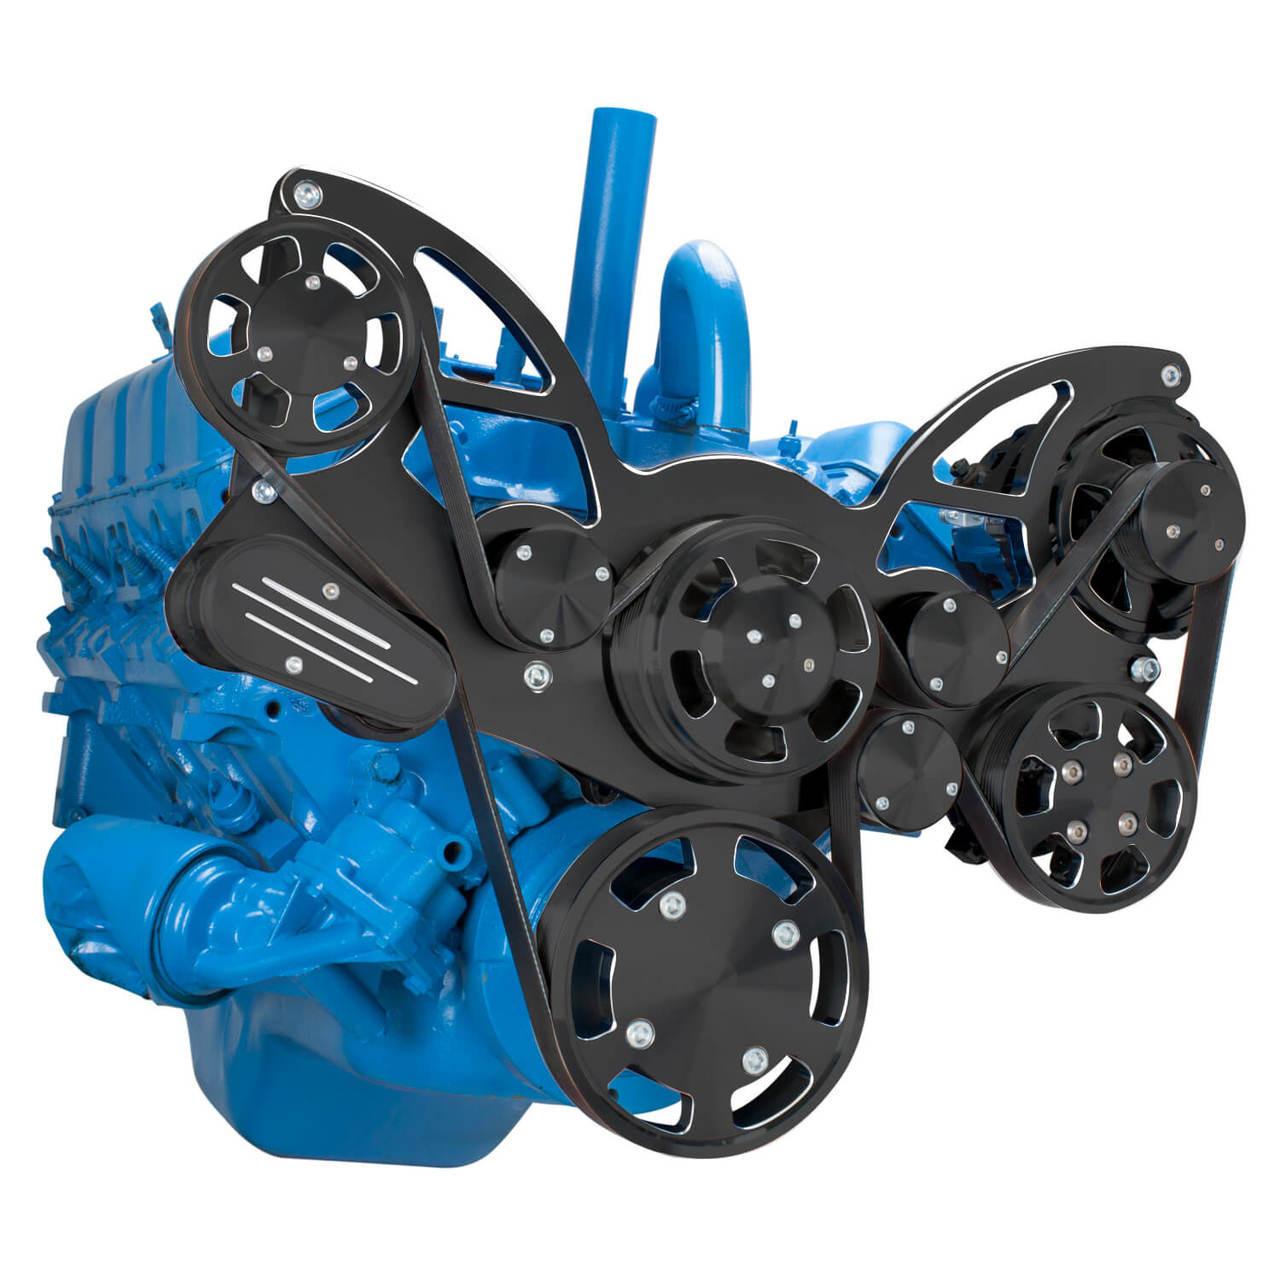 medium resolution of stealth black serpentine conversion kit for amc jeep with power steering alternator